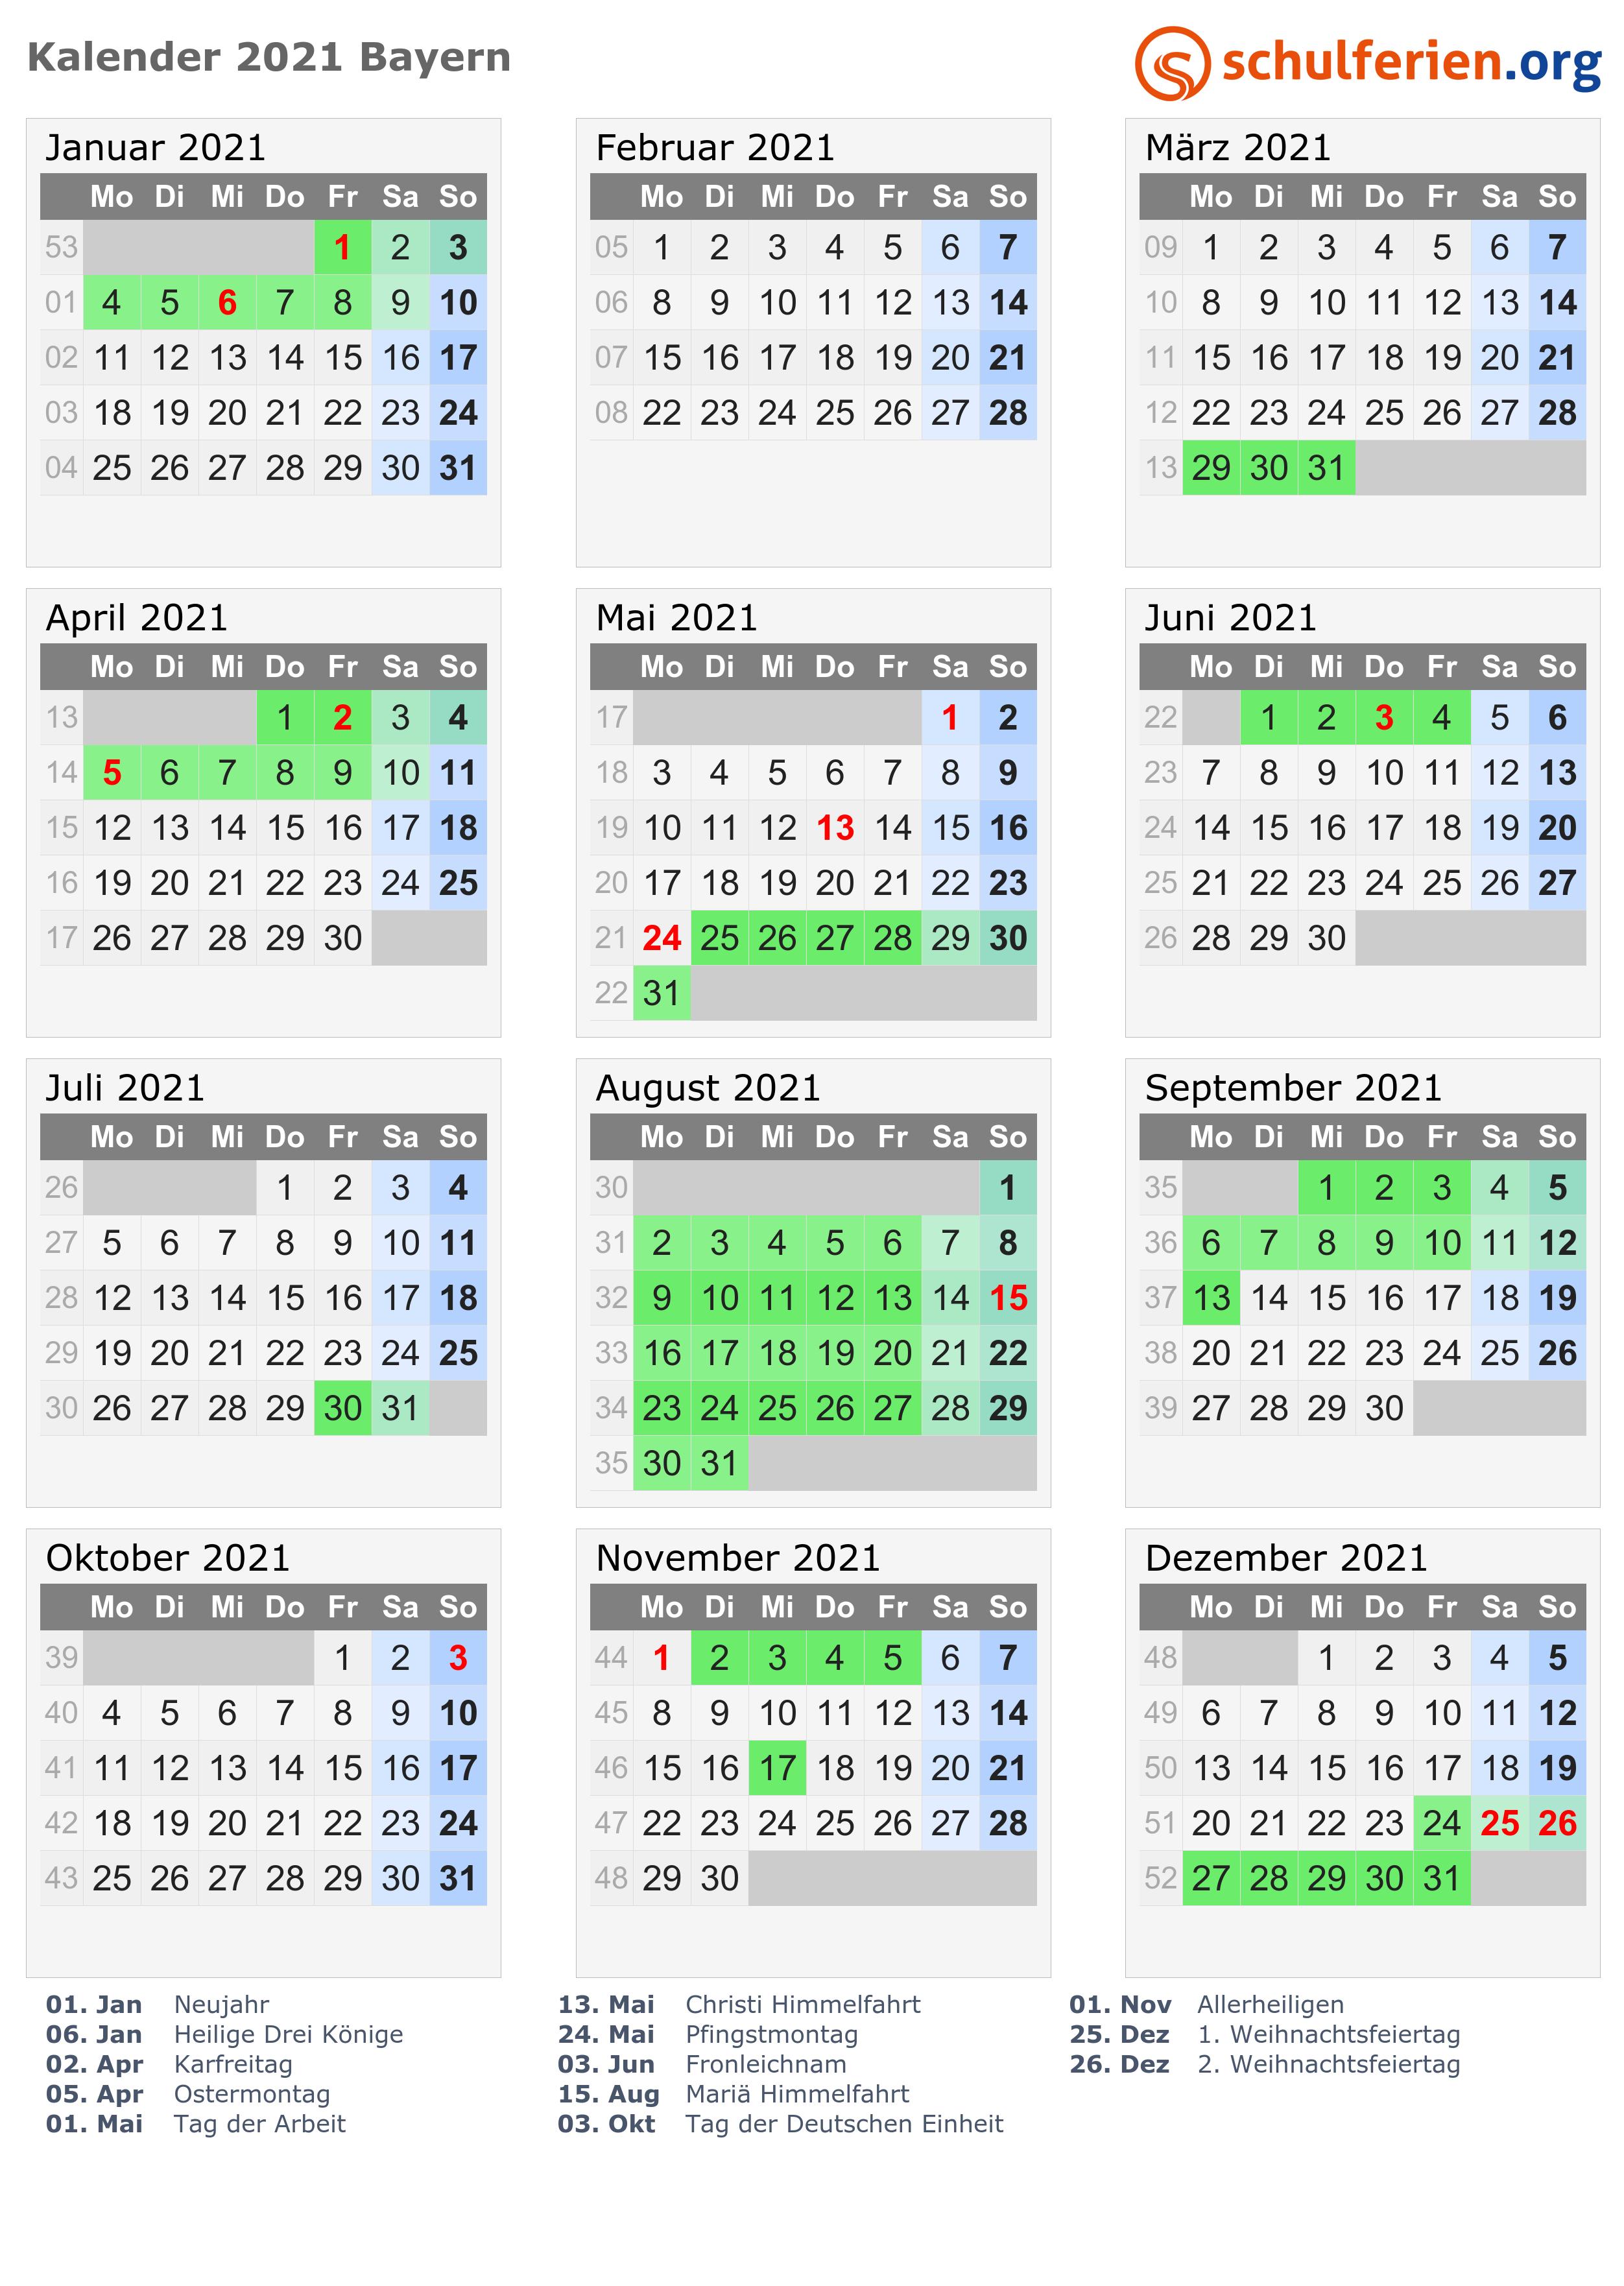 Kalender 2020 feiertage bayern